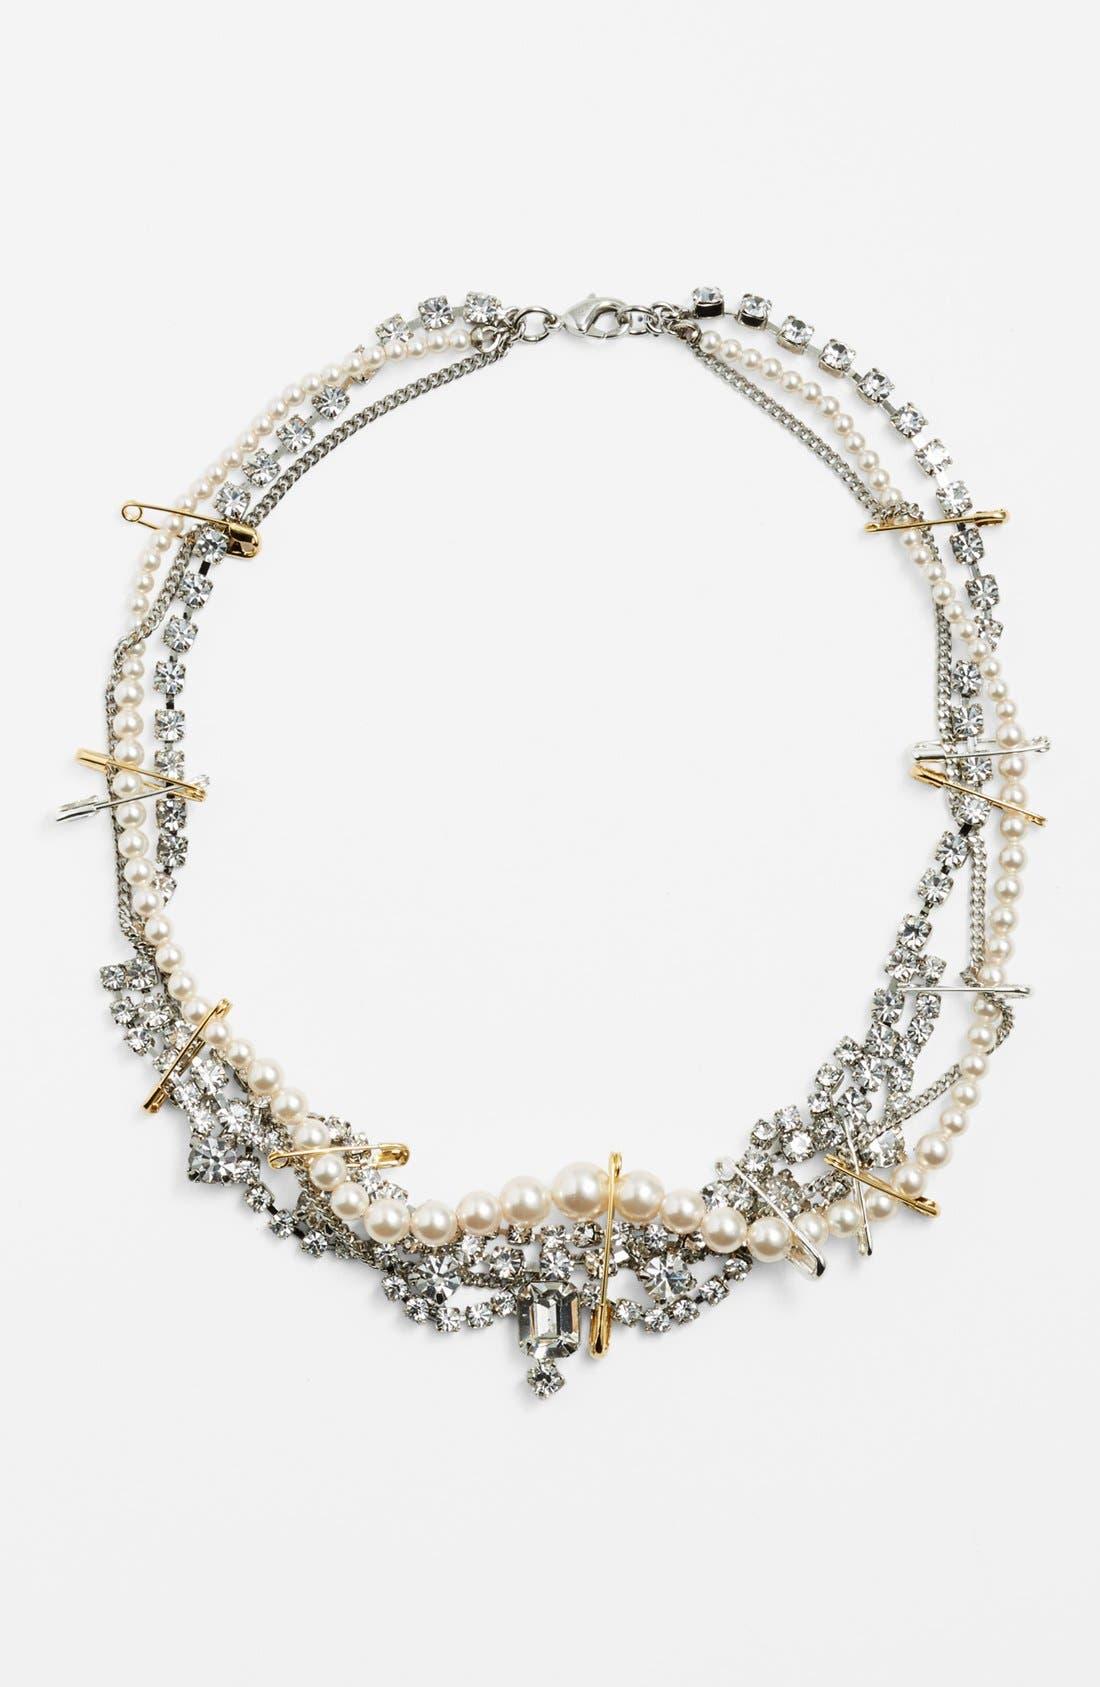 Main Image - Tom Binns 'Pearls in Peril' Necklace